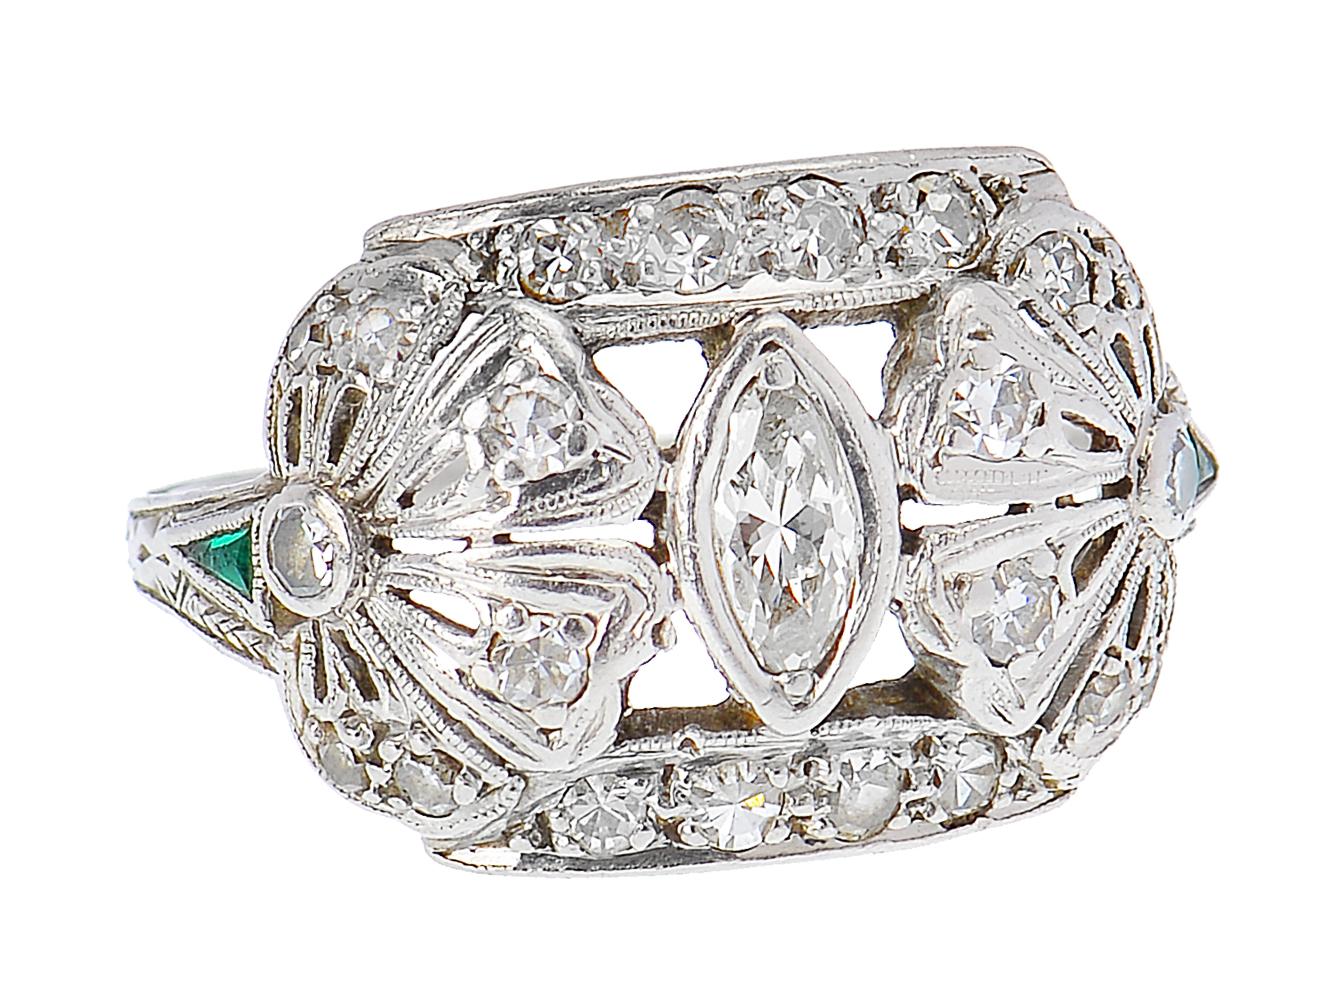 Generous 10k White & Rose Gold 5.5mm Round Semi Mount Diamonds Wedding Halo Ring Pure Whiteness Fine Rings Fine Jewelry